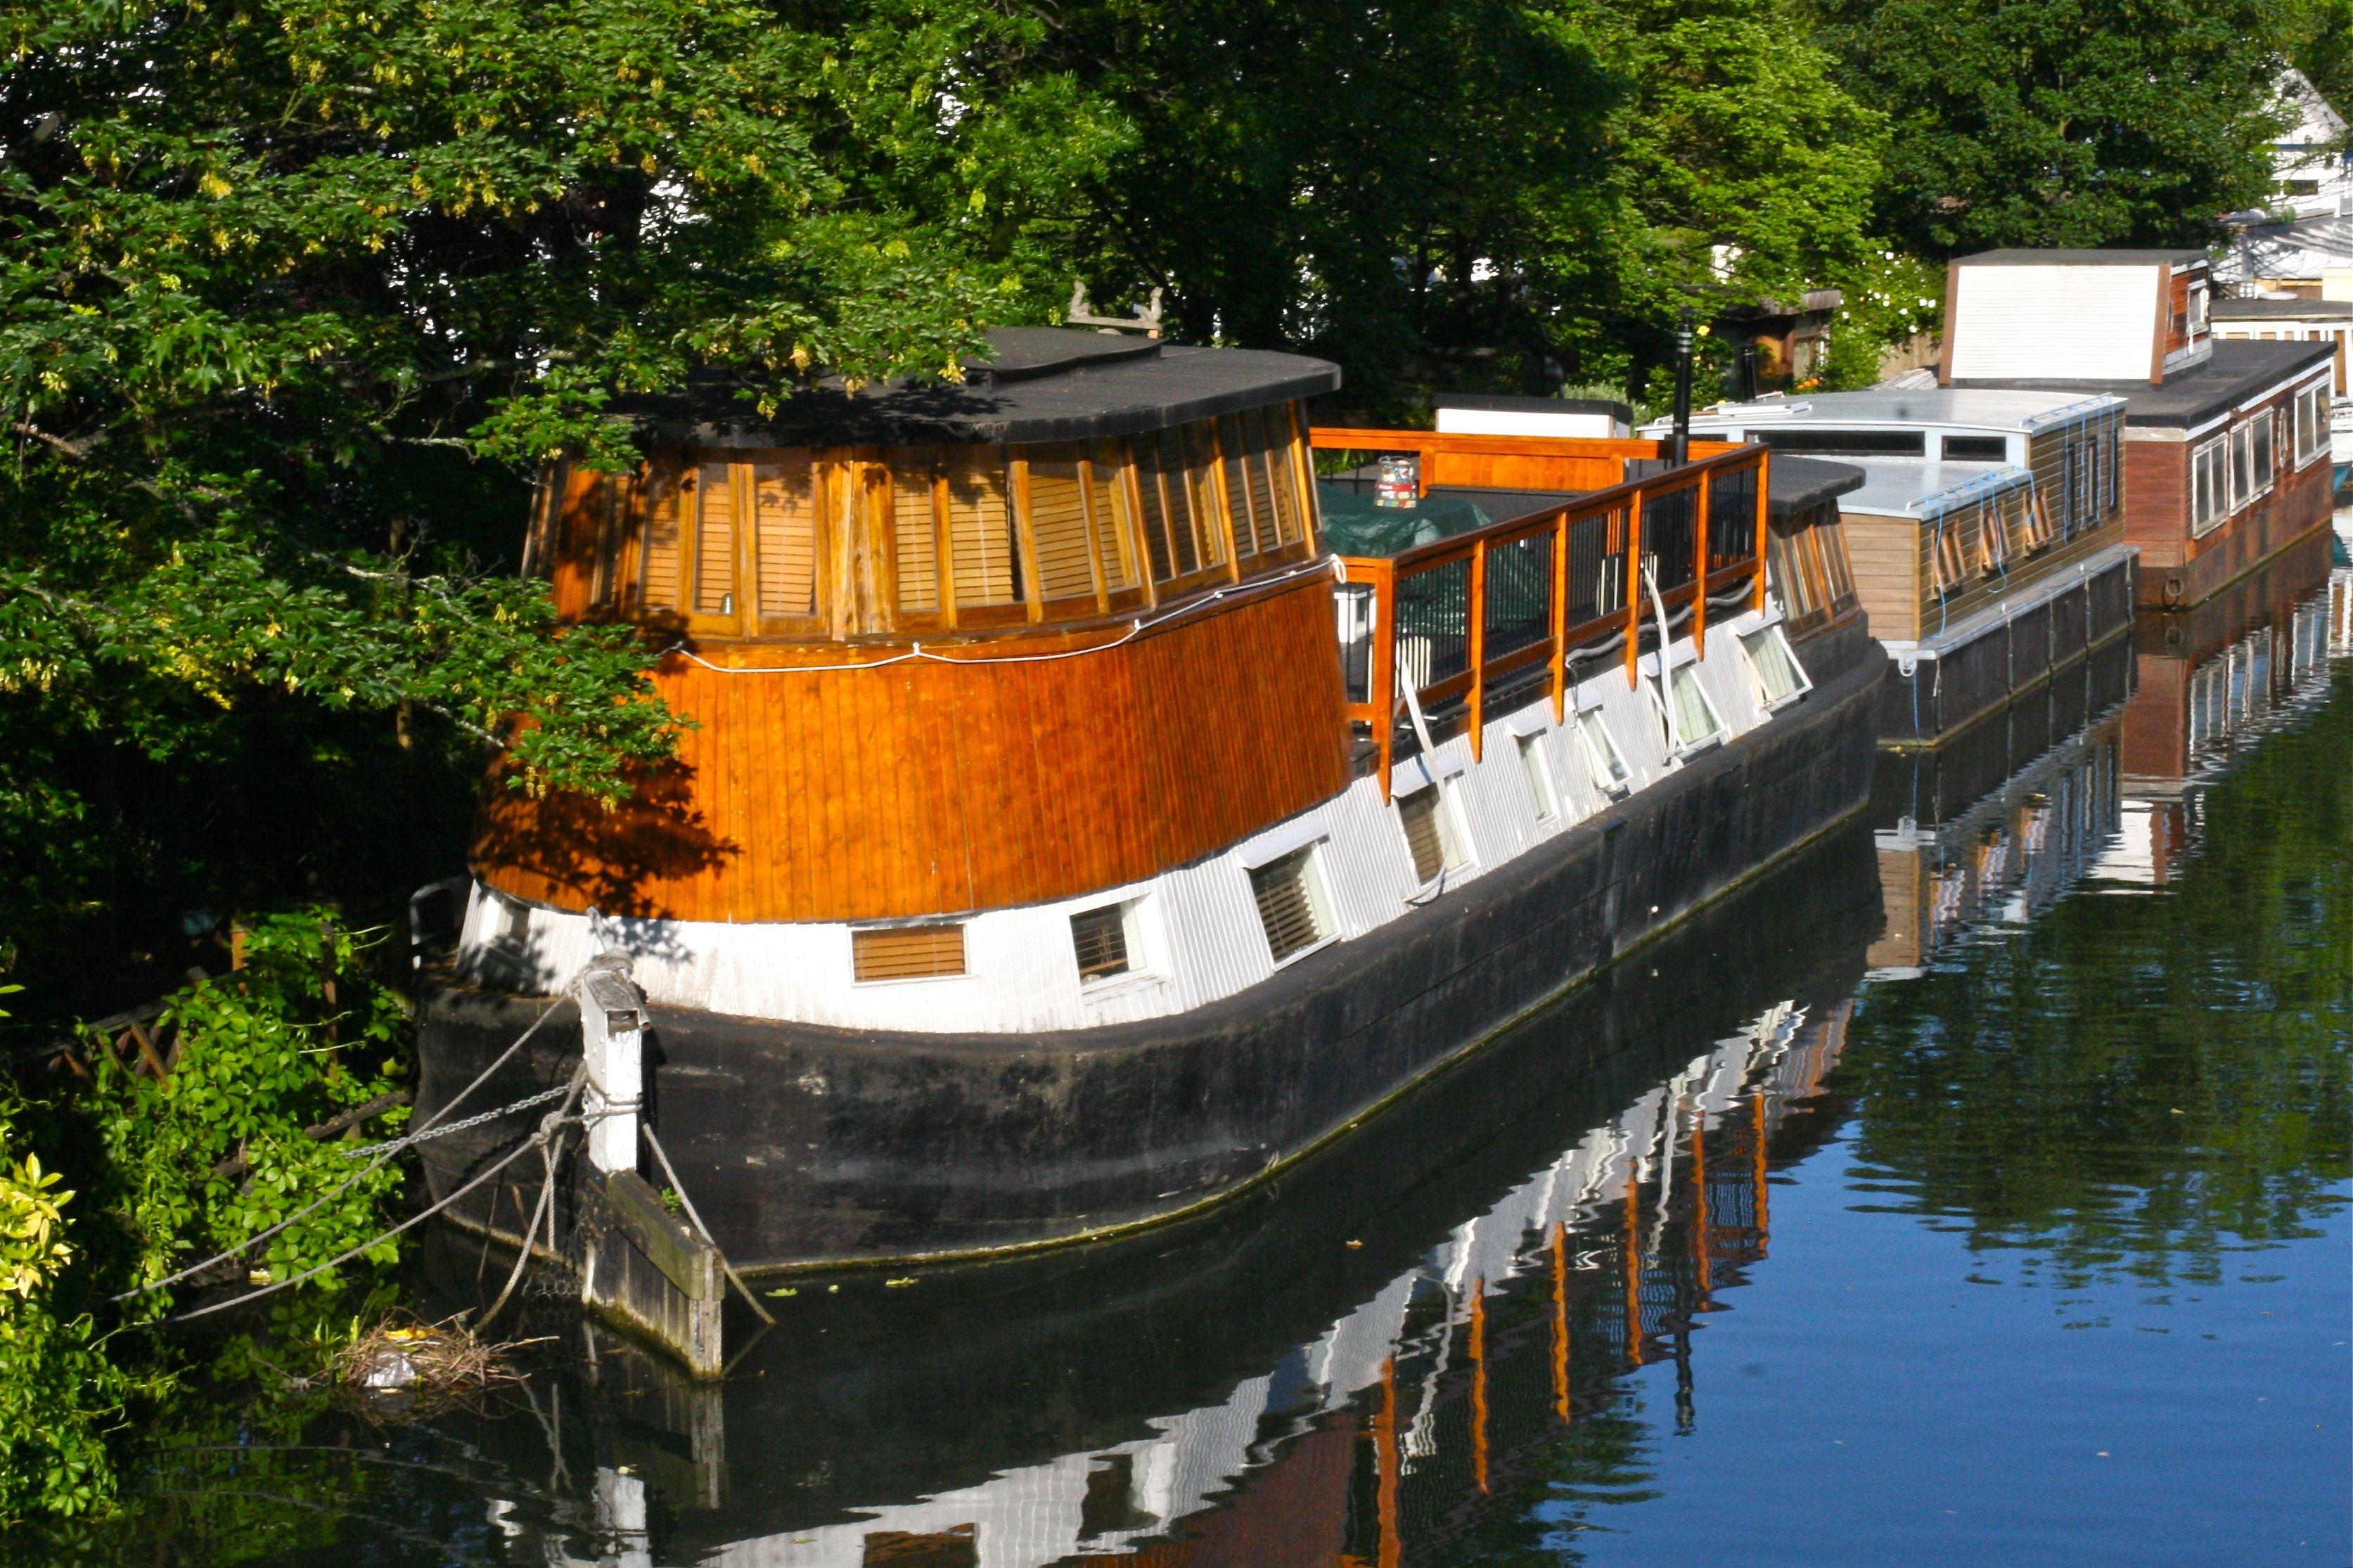 Richard Branson S Enormous Houseboat Little Venice I Think His